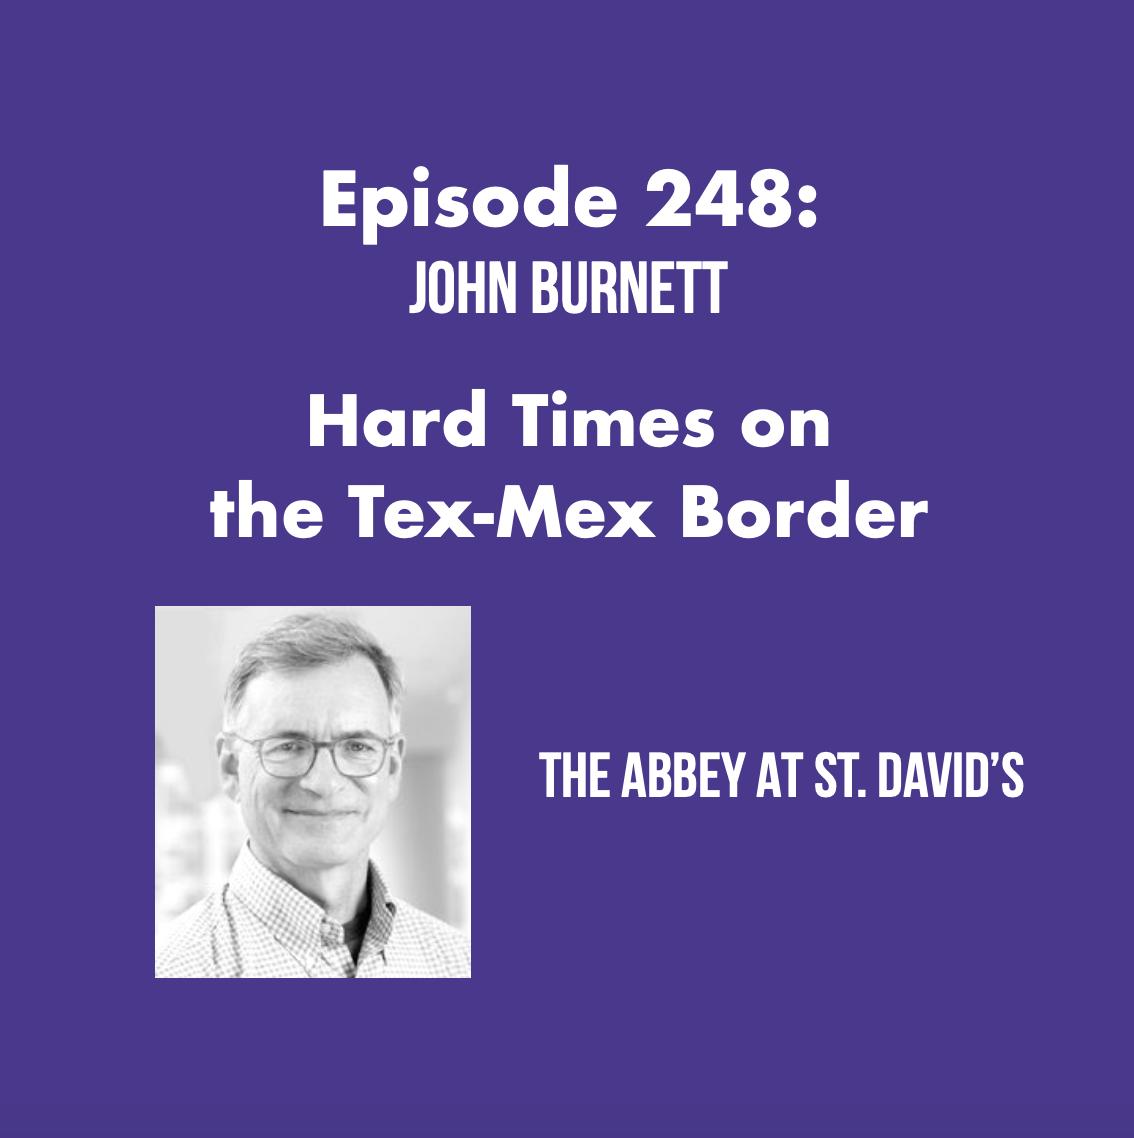 Episode 248: Hard Times on the Tex-Mex Border with John Burnett